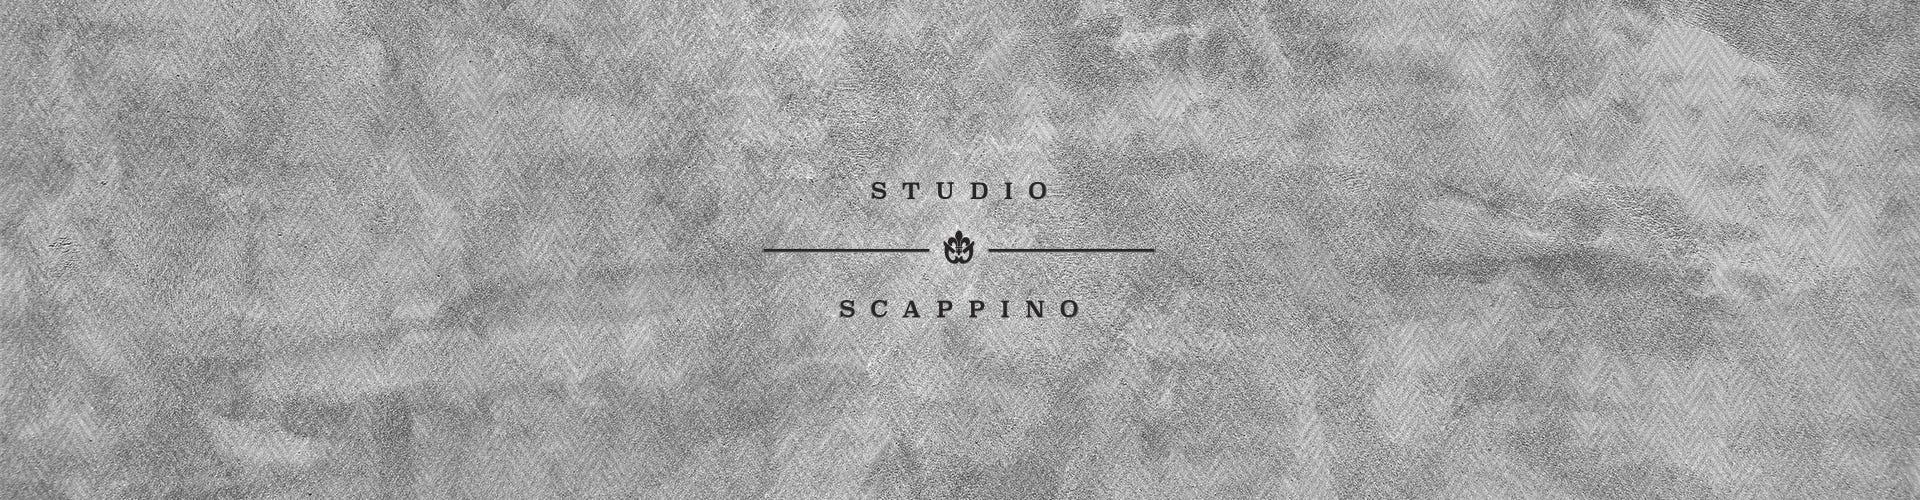 Studio Scappino